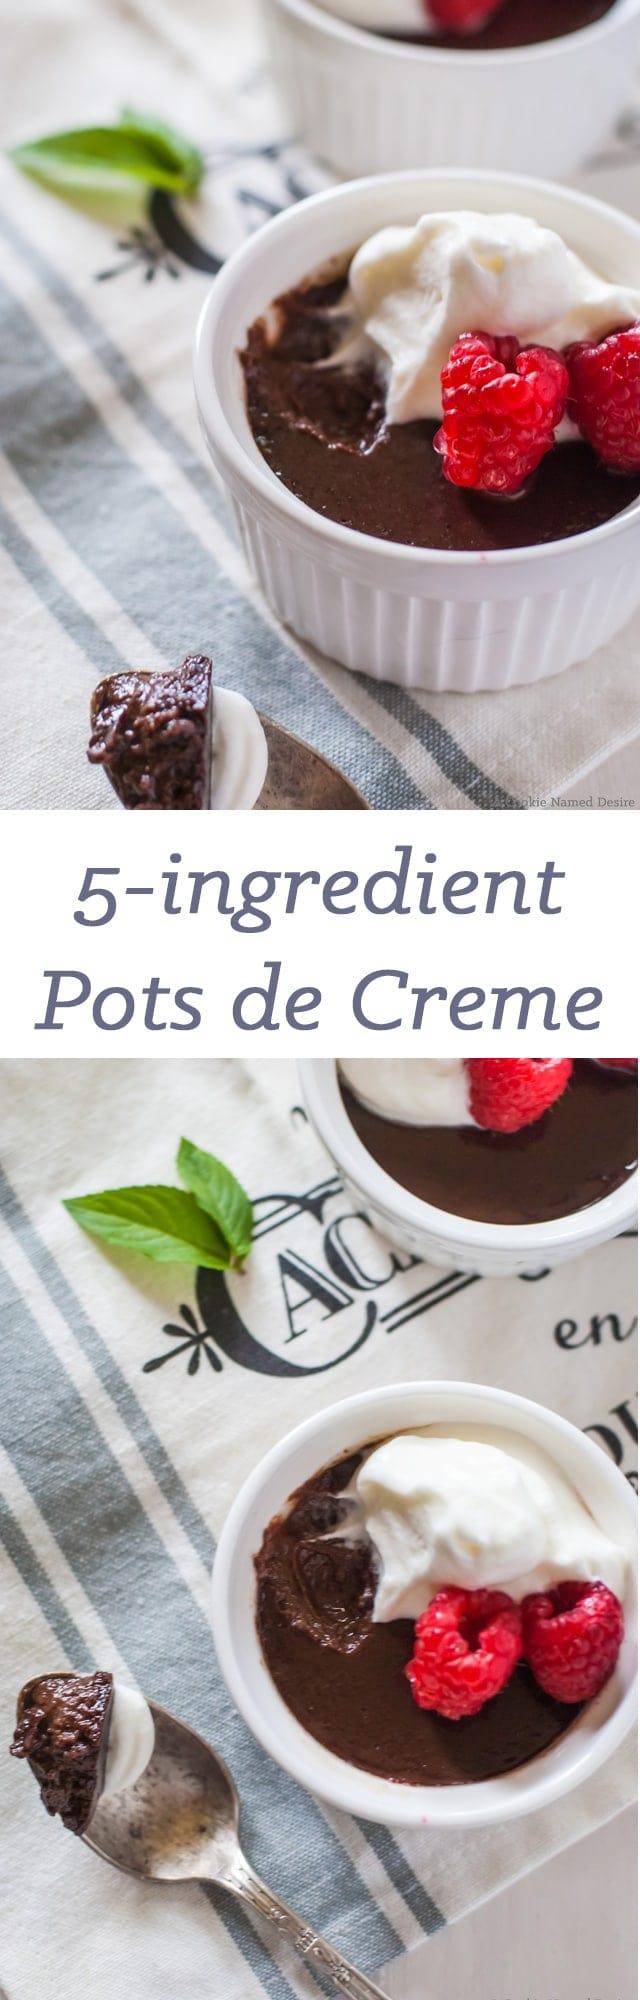 simple 5 ingredient pots de creme - dairy free dessert!